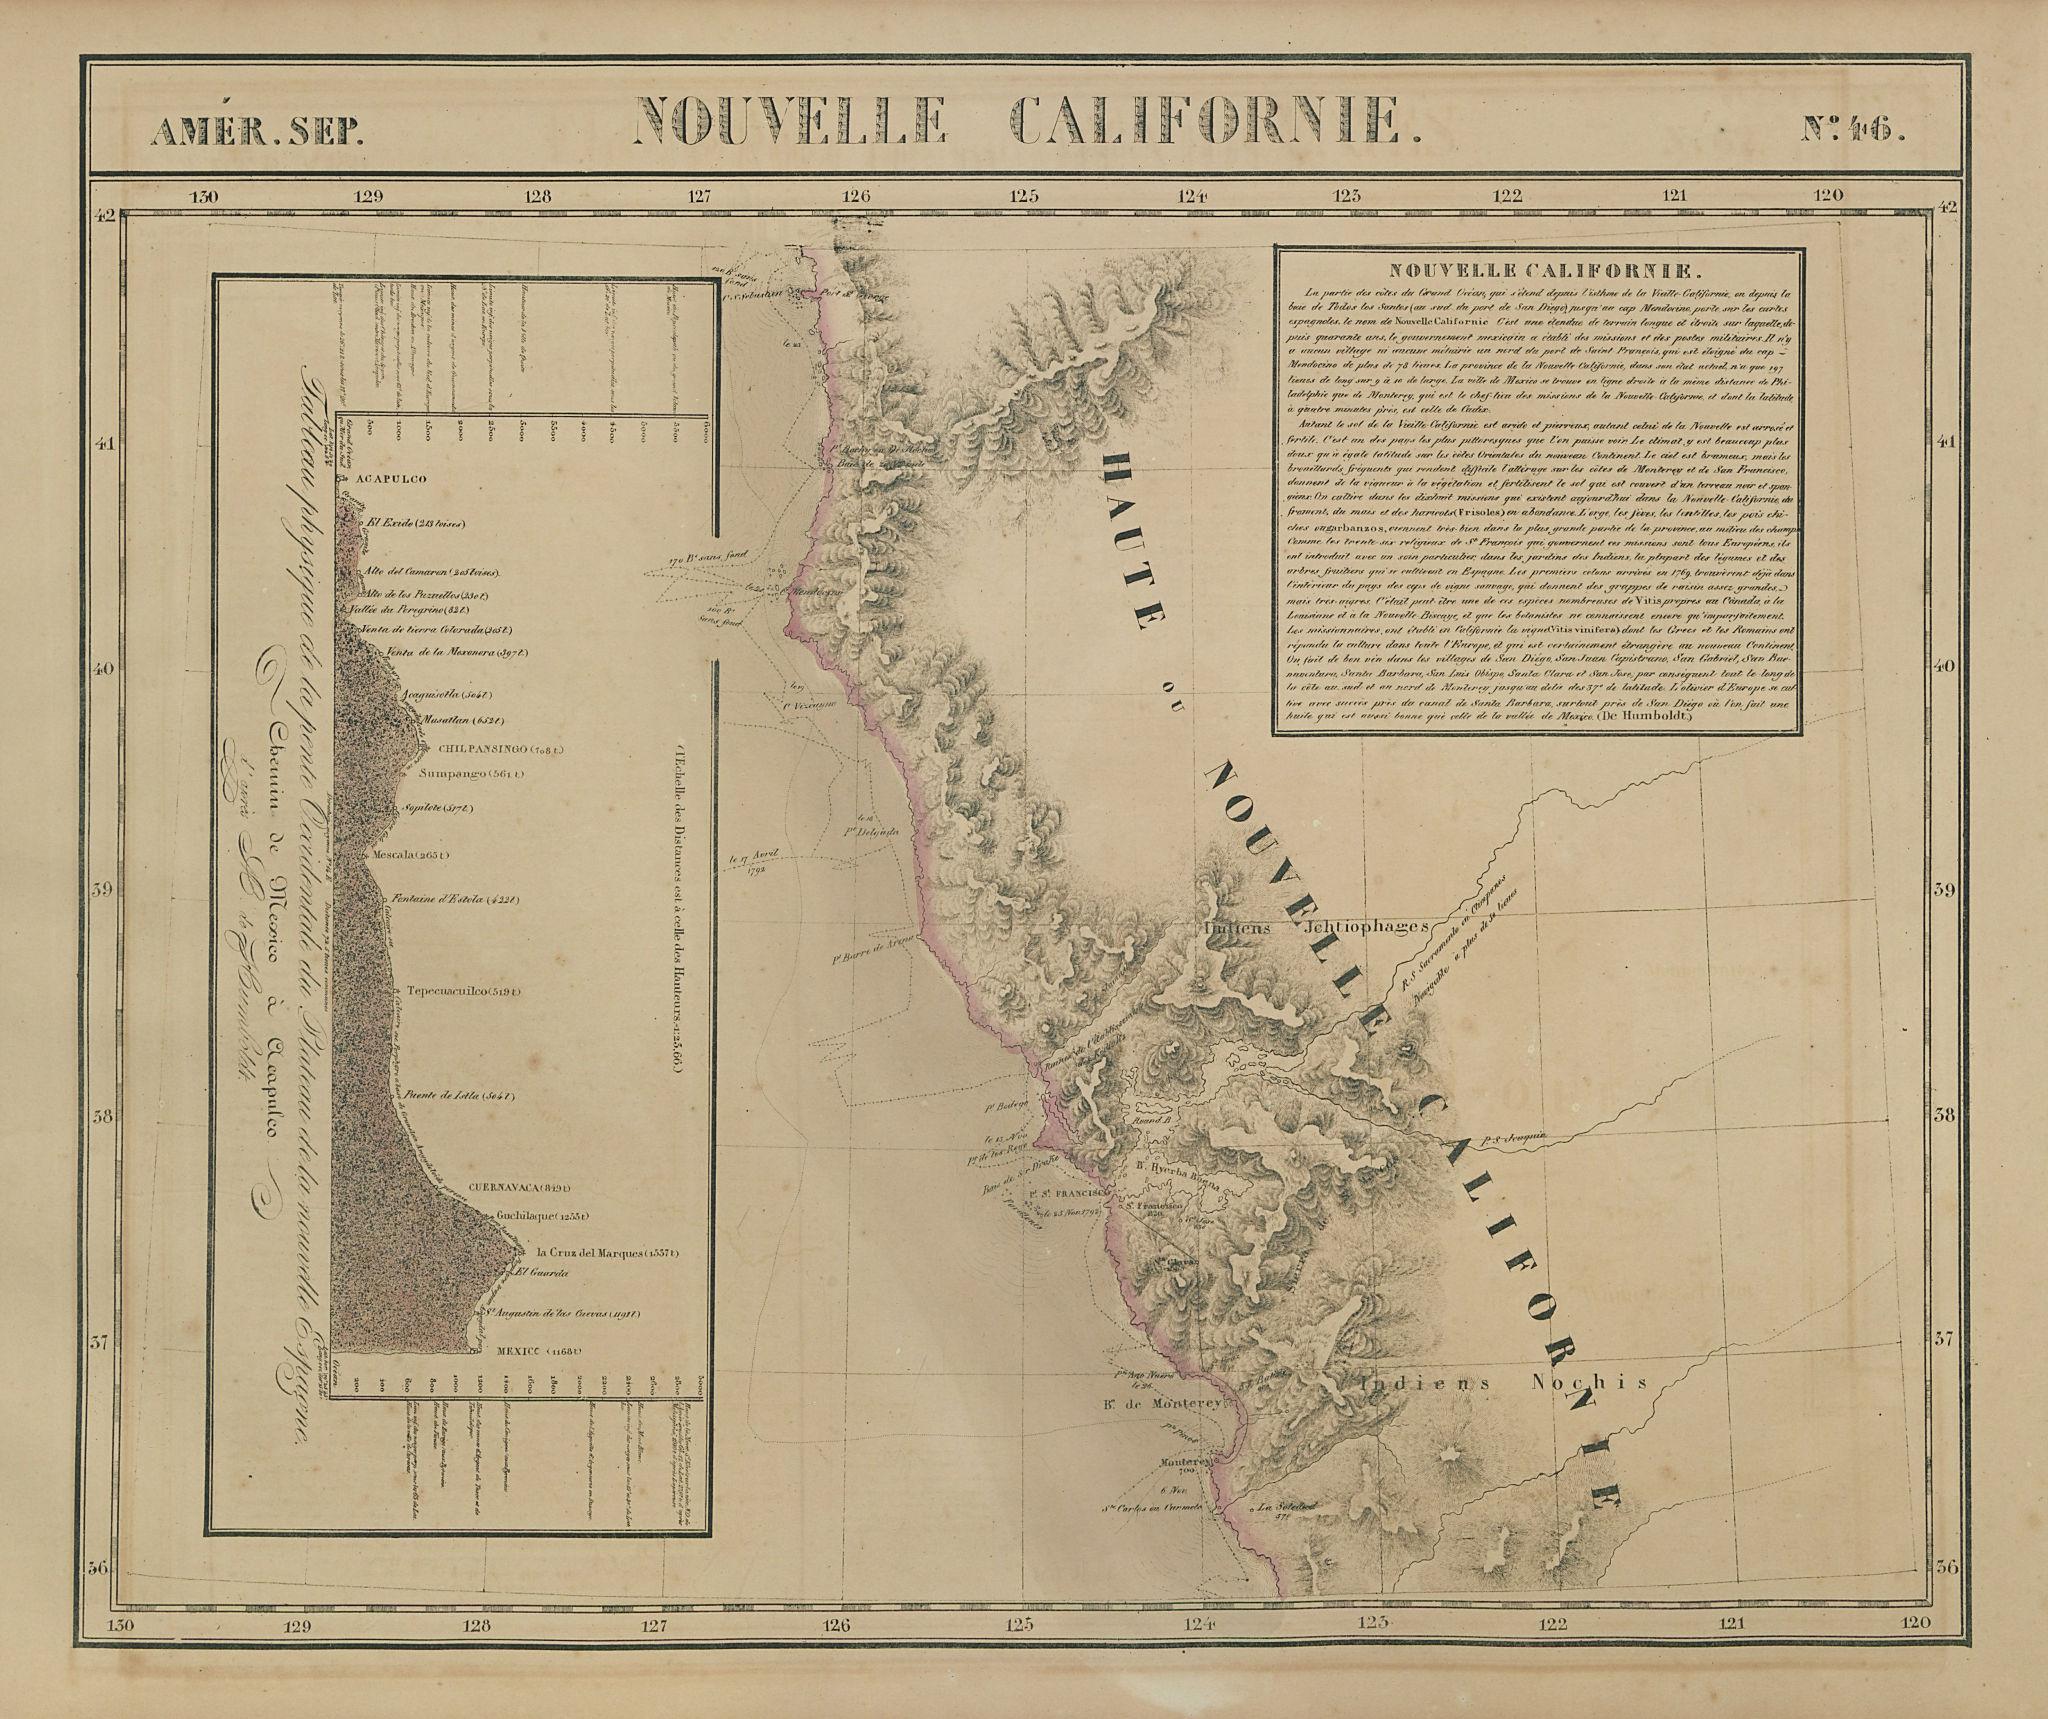 Amér. Sep. Nouvelle Californie #46. Northern California. VANDERMAELEN 1827 map